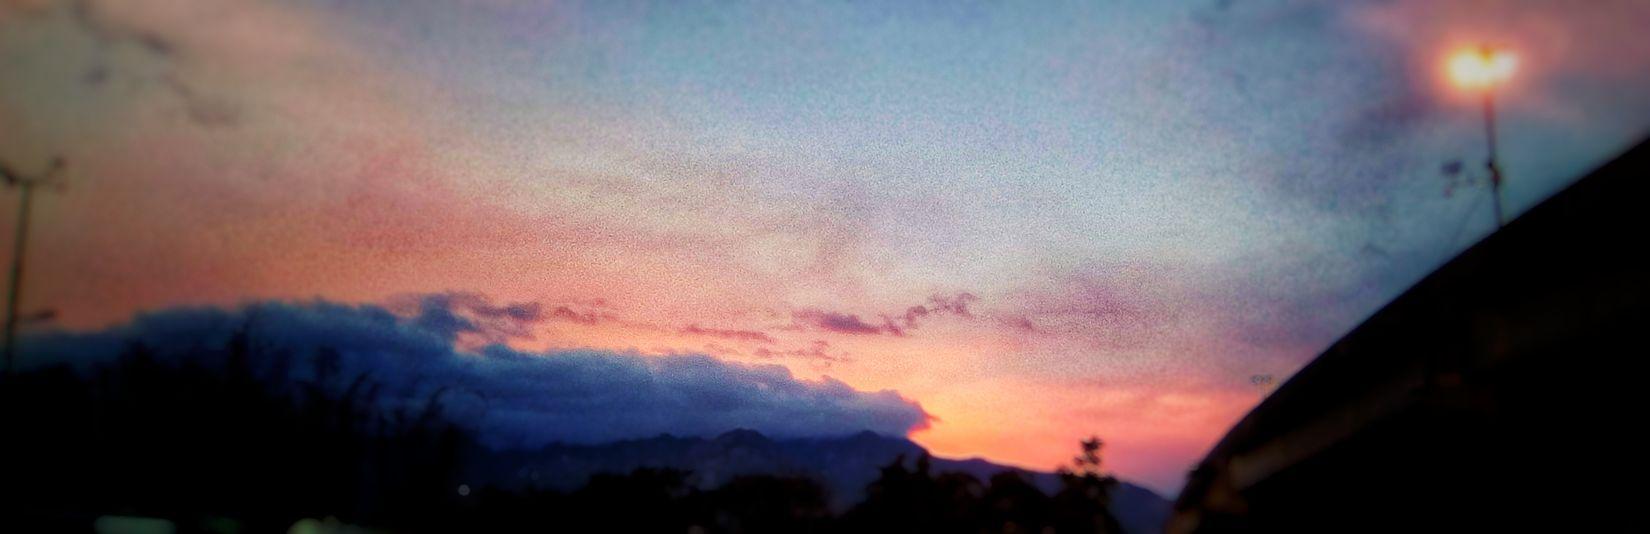 colors of the sunrise morning Sunrise Sunrise_sunsets_aroundworld Sunrise_Collection San Jose, Costa Rica Costa Rica 🇨🇷 Costa Rica❤ Eyemphotography EyeEm Best Shots Tree Sunset Silhouette Astronomy Dramatic Sky Galaxy Sky